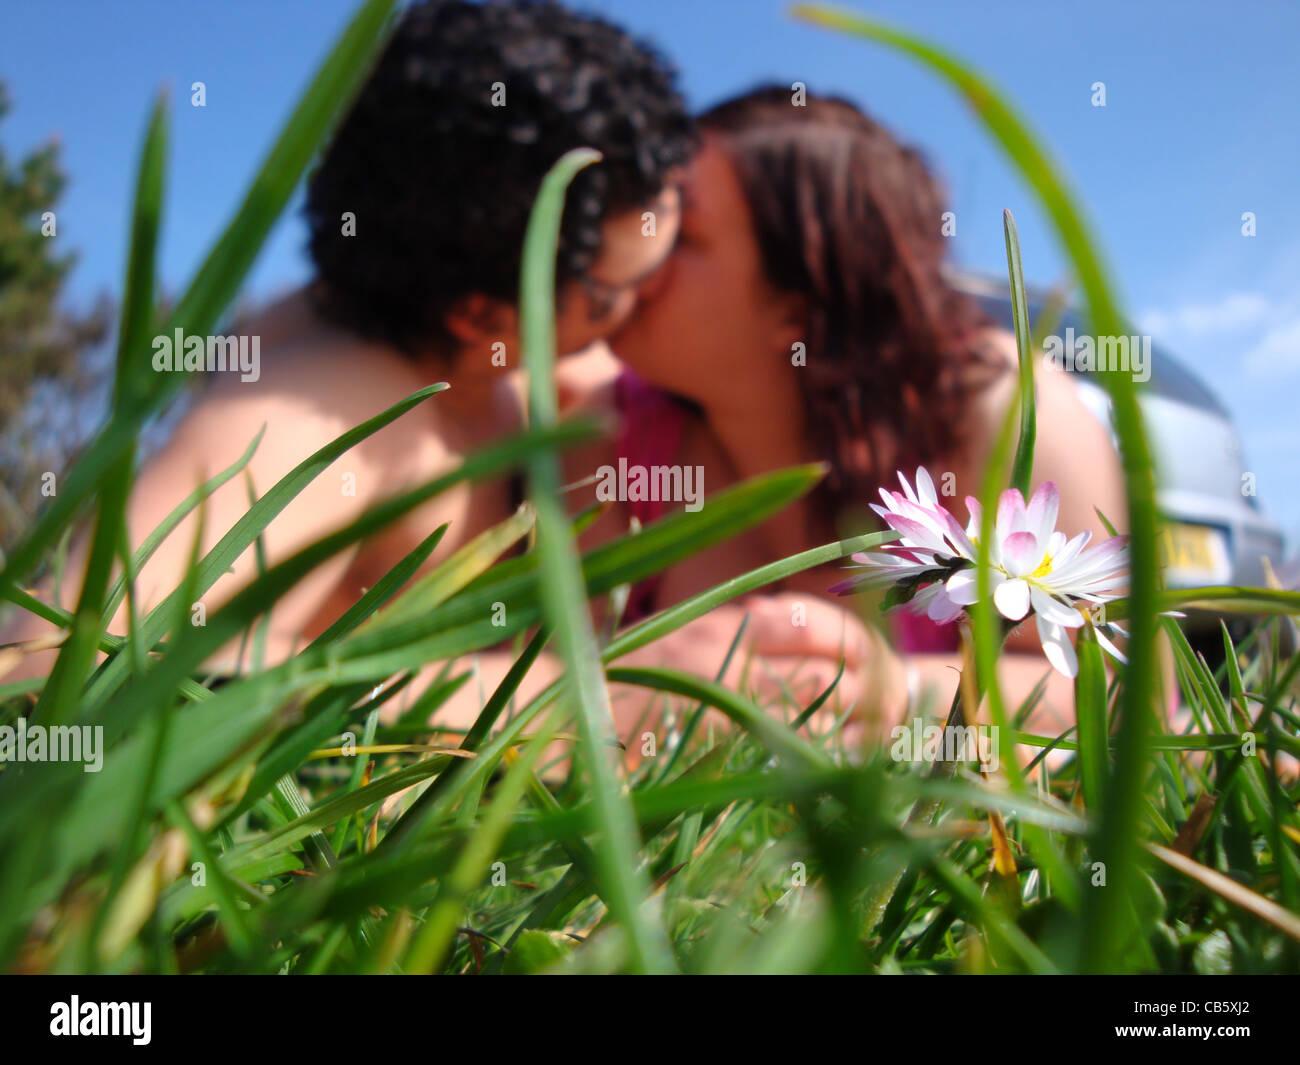 Loving couple kiss - Stock Image